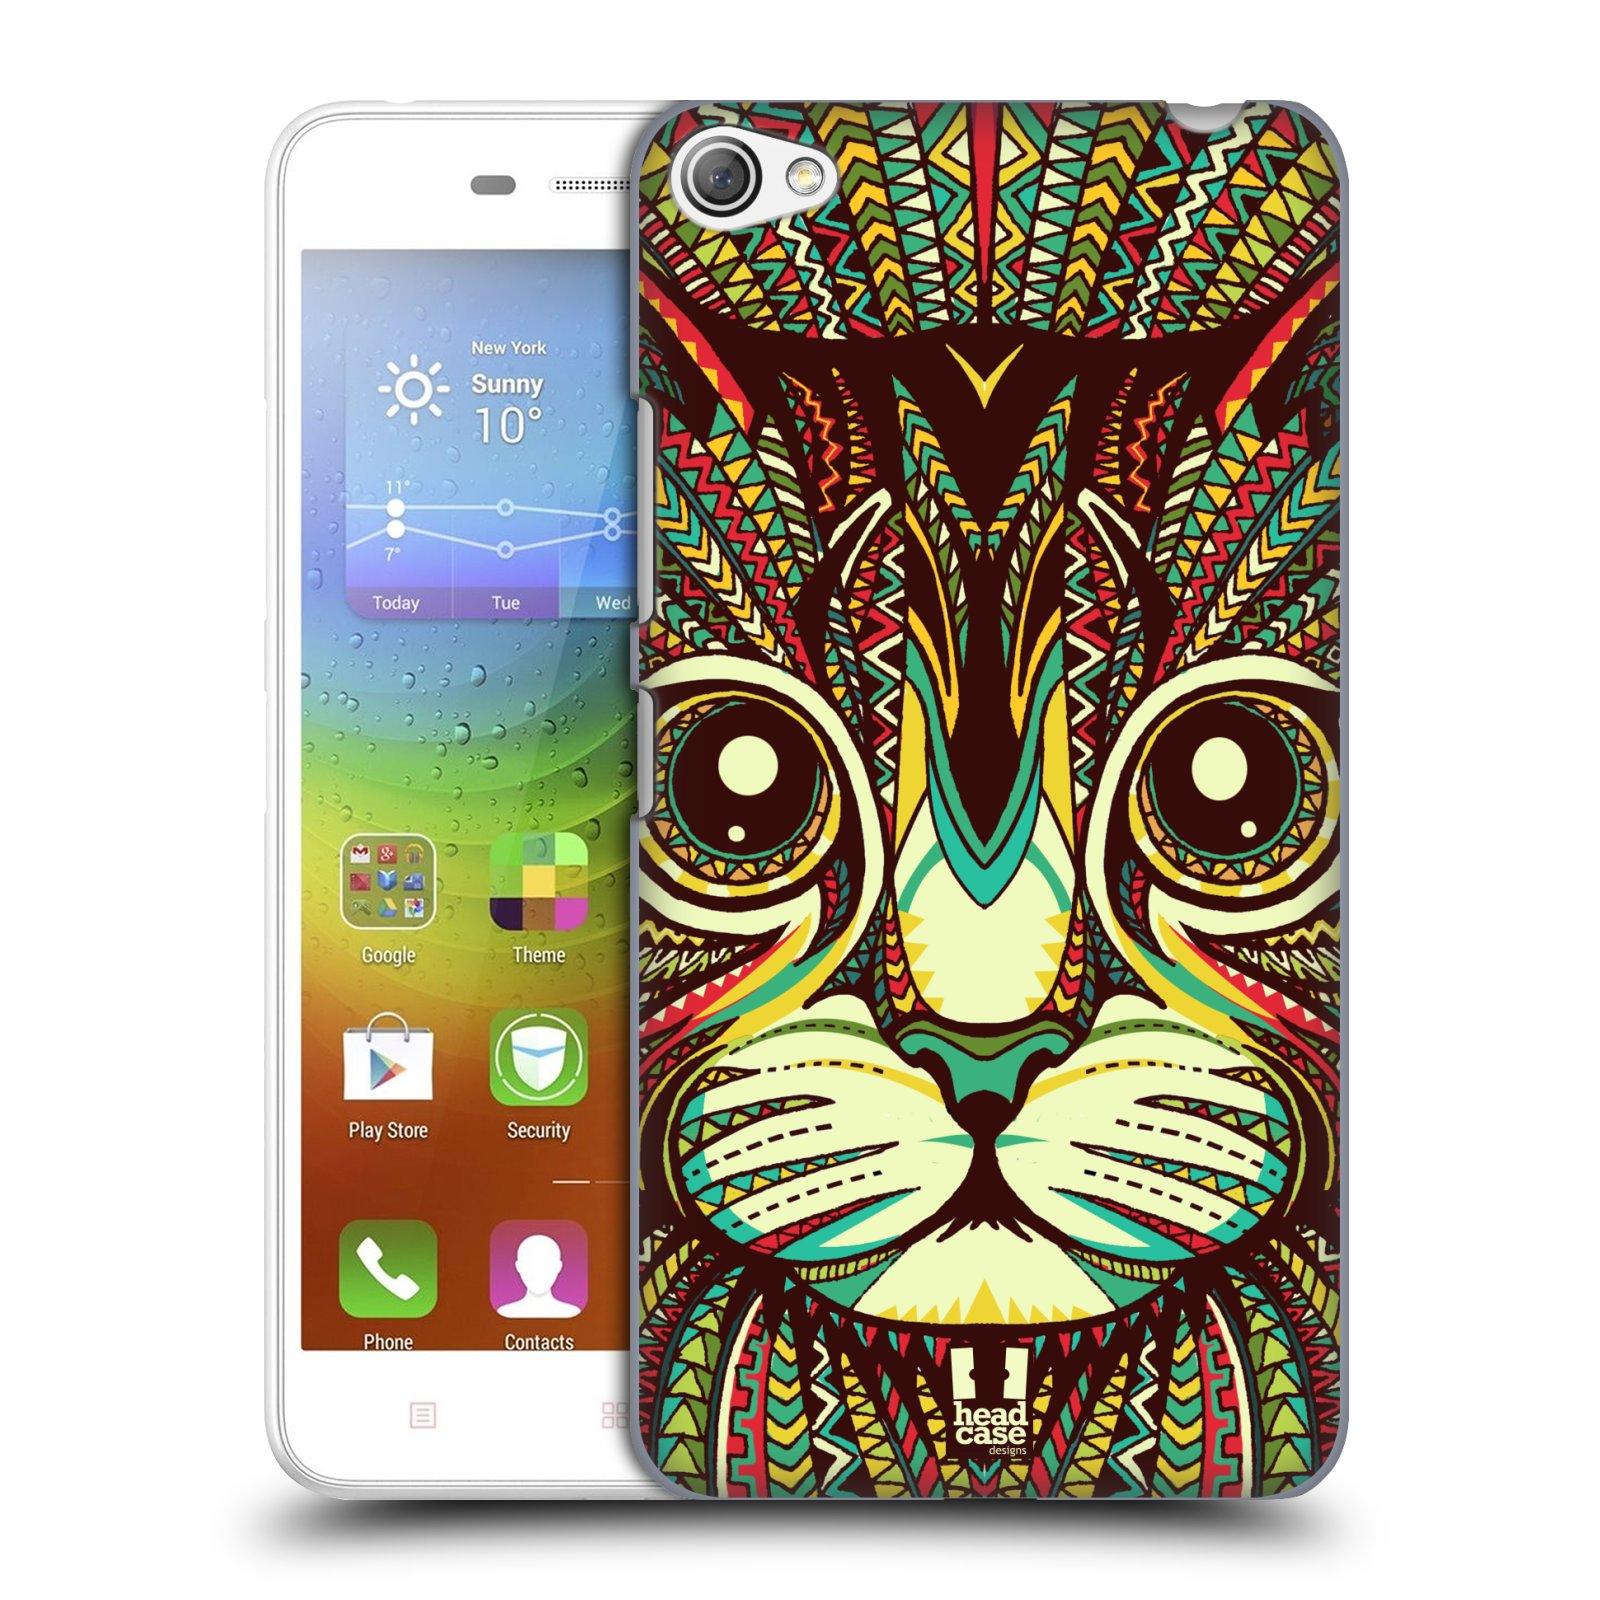 HEAD CASE pevný plastový obal na mobil LENOVO S60 / LENOVO S60 DUAL SIM vzor Aztécký motiv zvíře 2 kotě